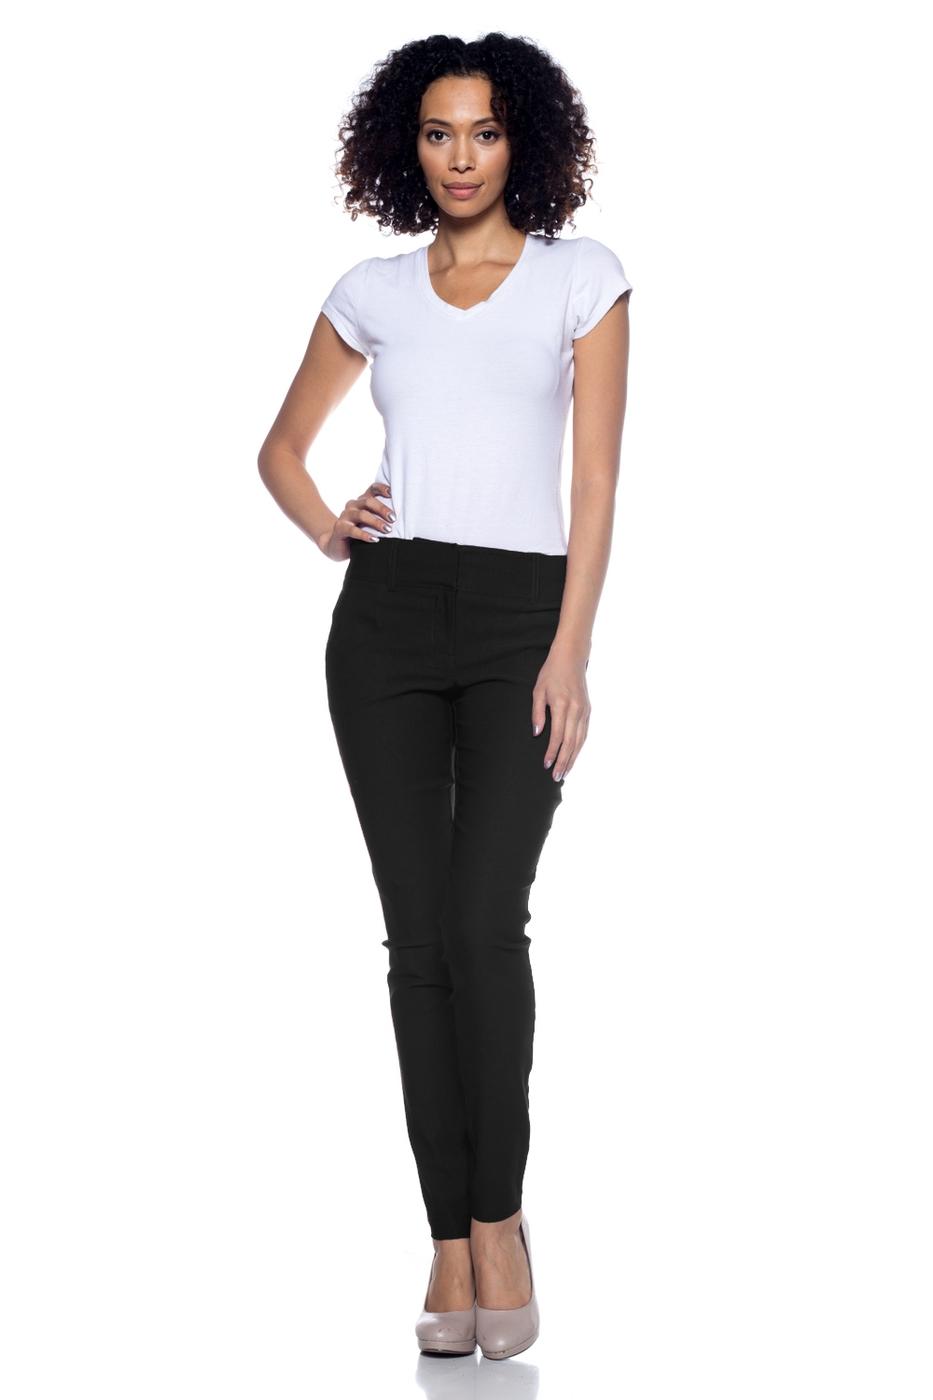 Feb 11, womens Skinny Office Casual Slim Pencil Pants Trousers xs.